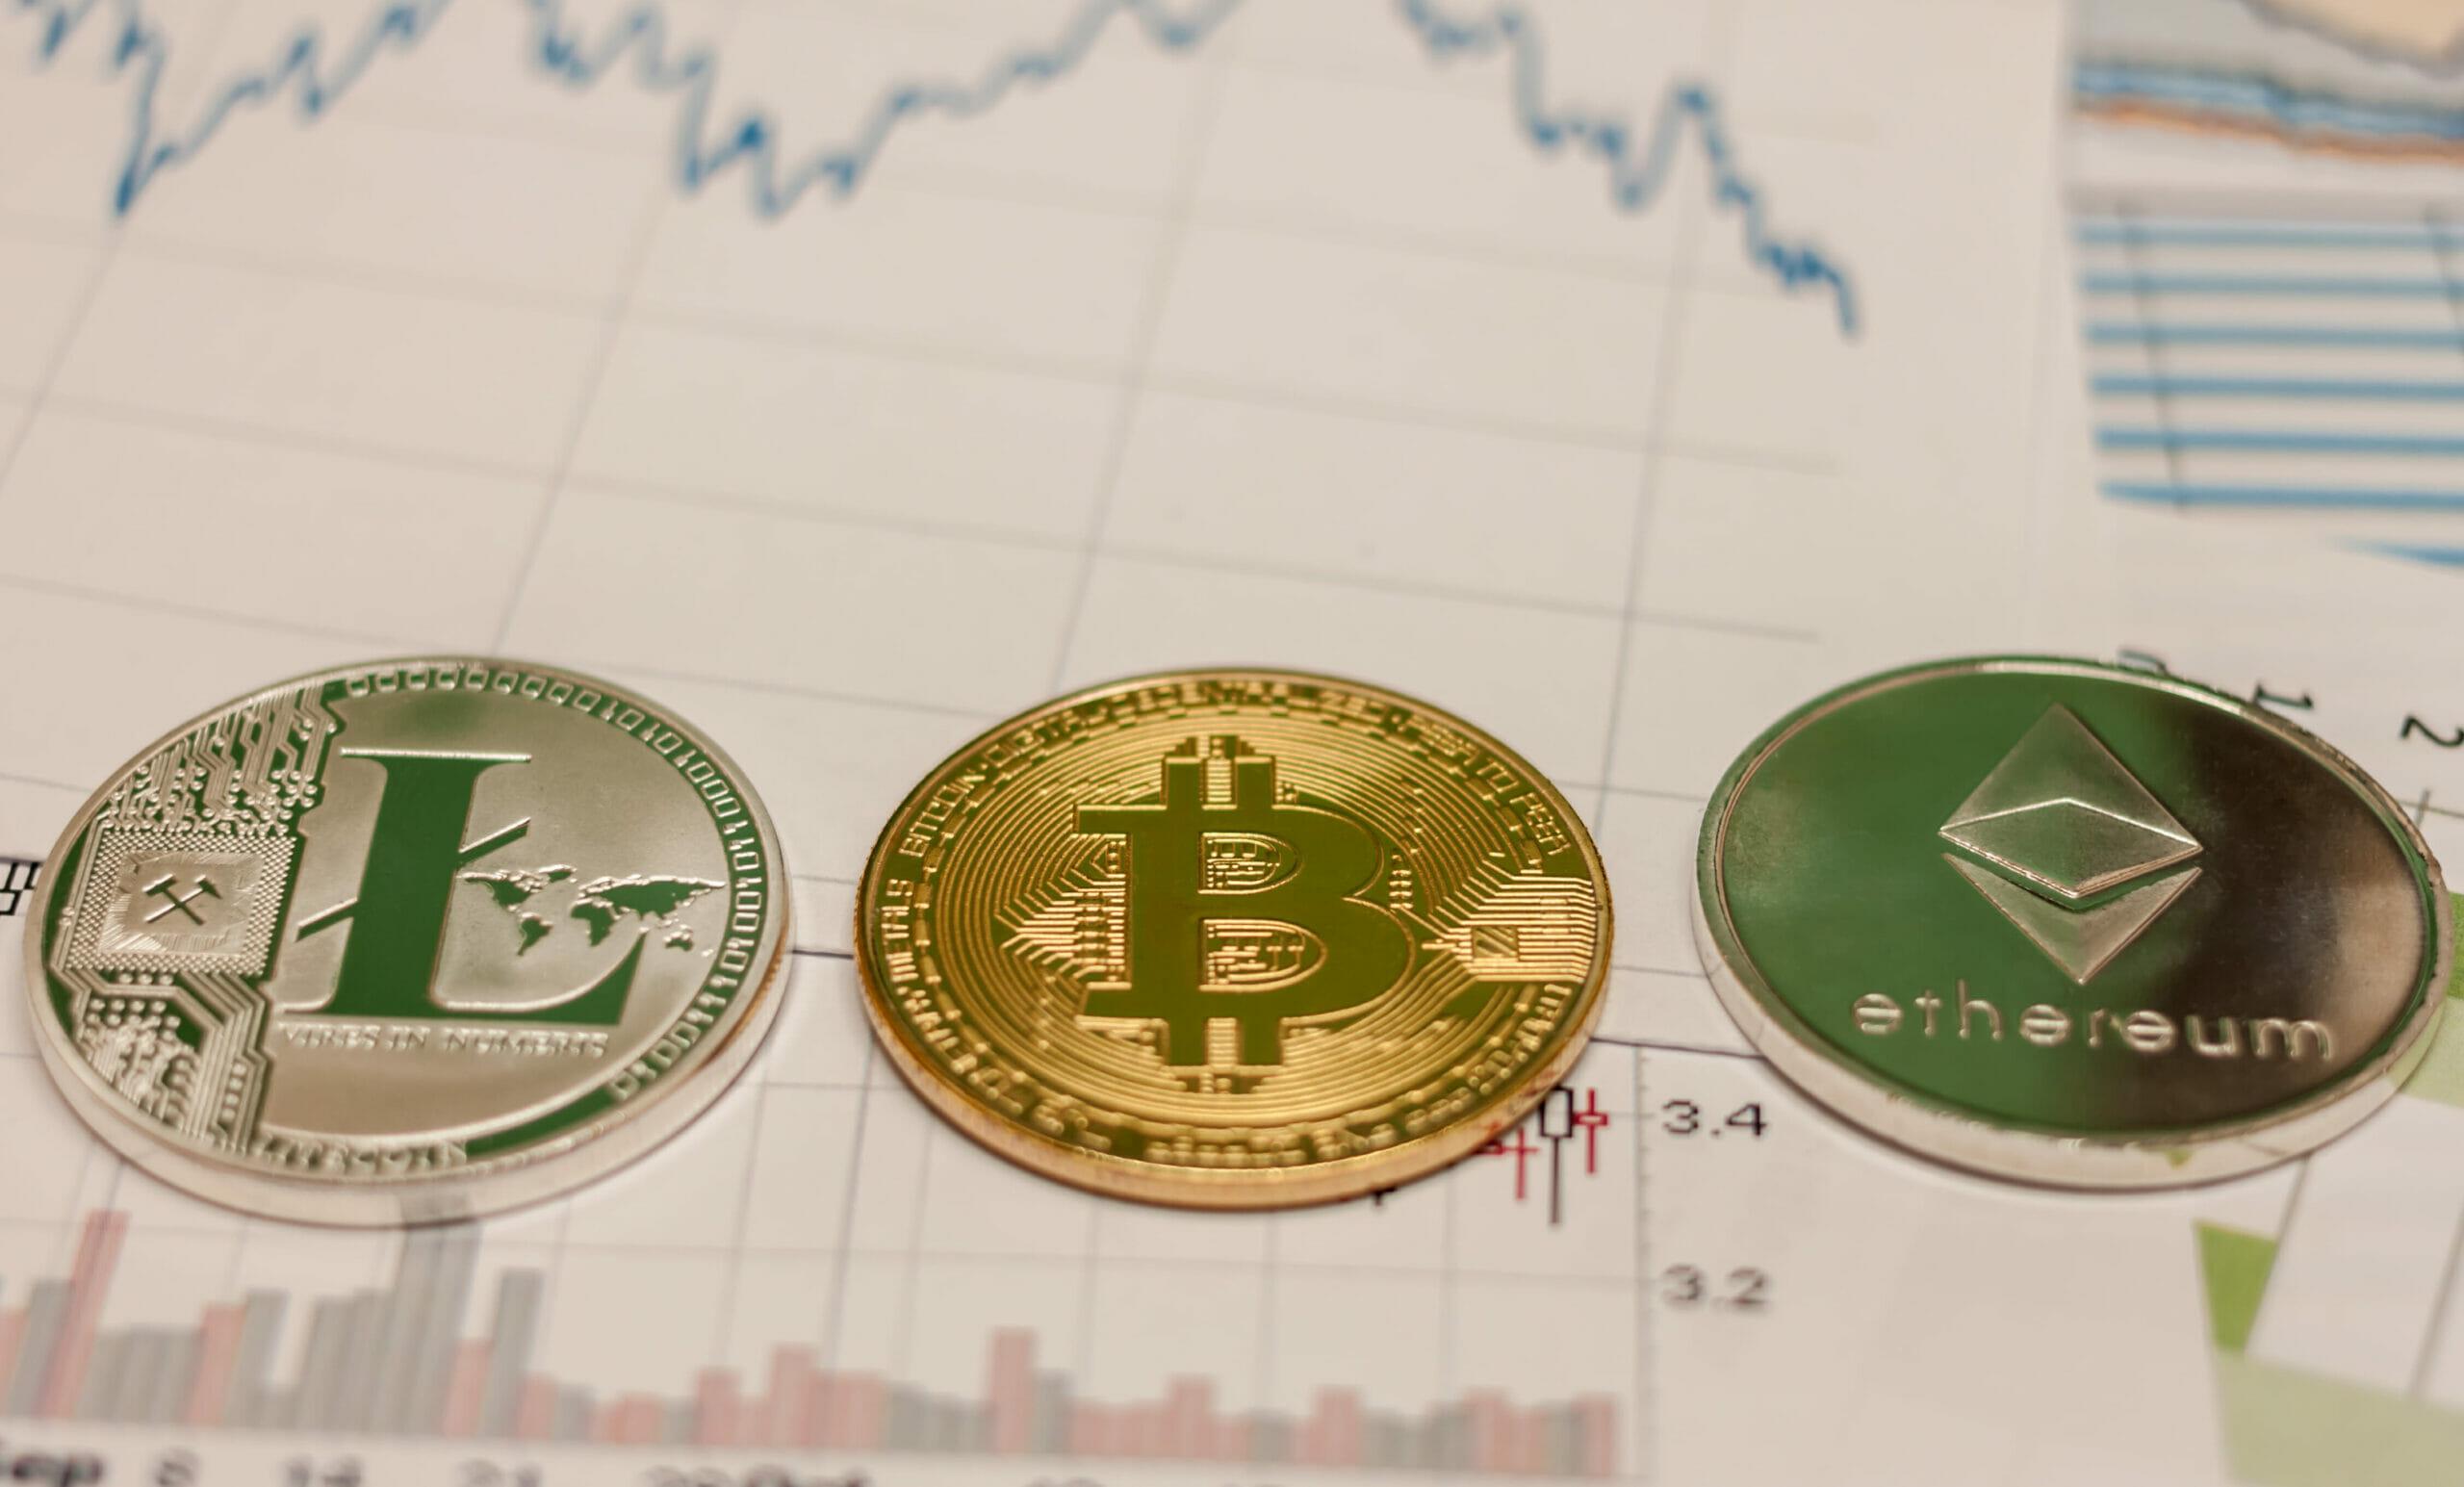 bitcoin ethereum litecoin coin and chart